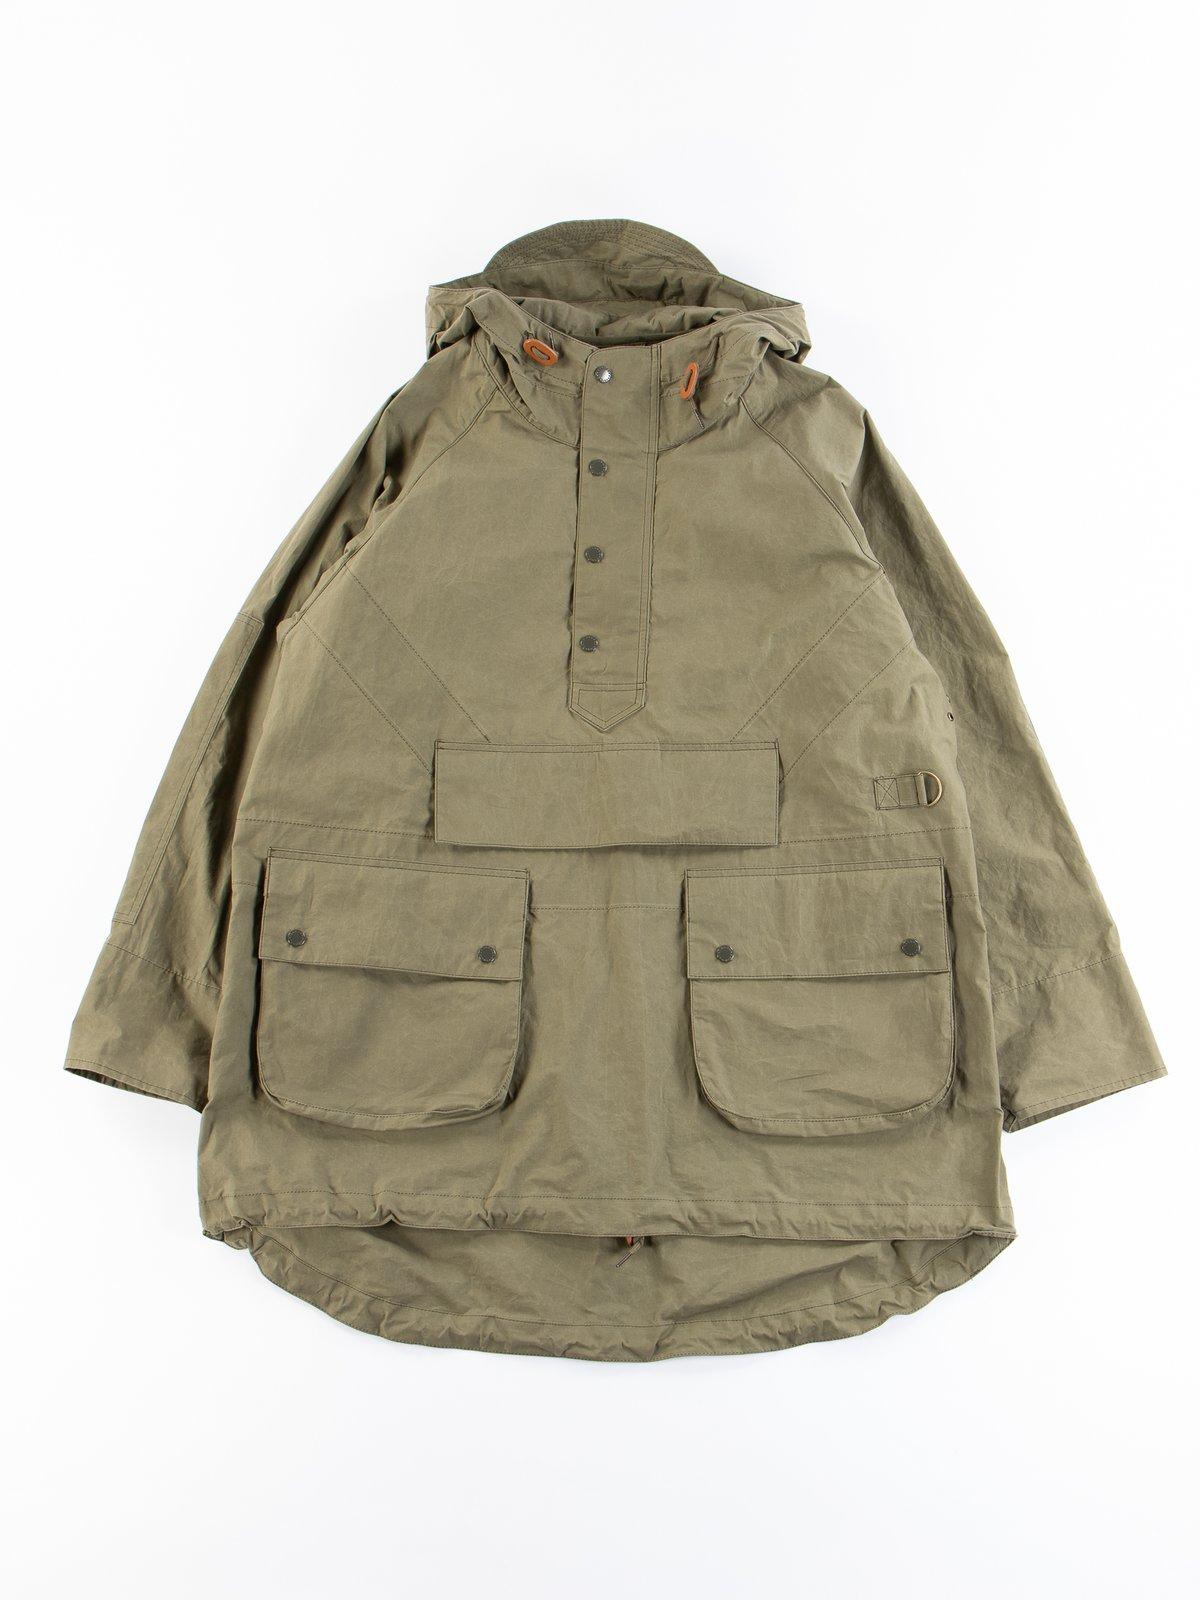 Olive Warby Jacket - Image 1